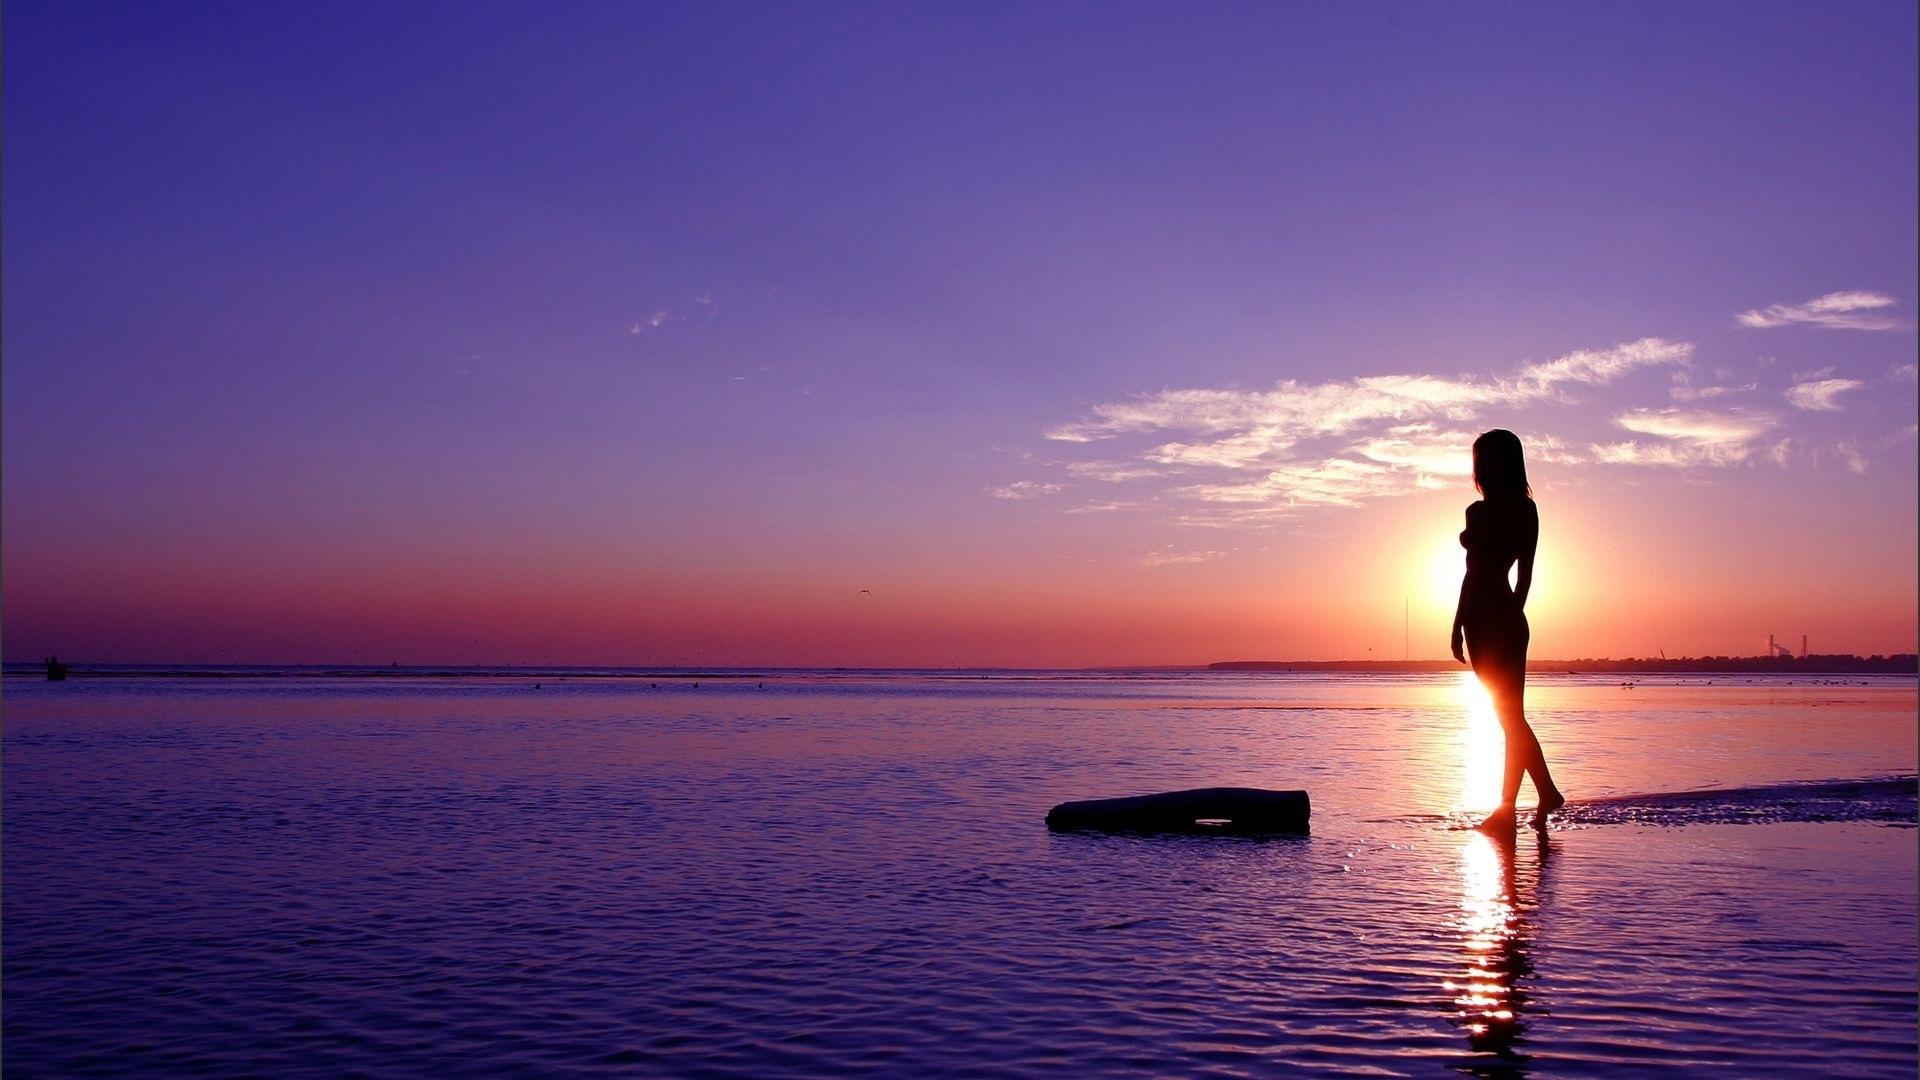 Beautiful Sunset Wallpaper Free Download Widescreen 2 HD Wallpapers